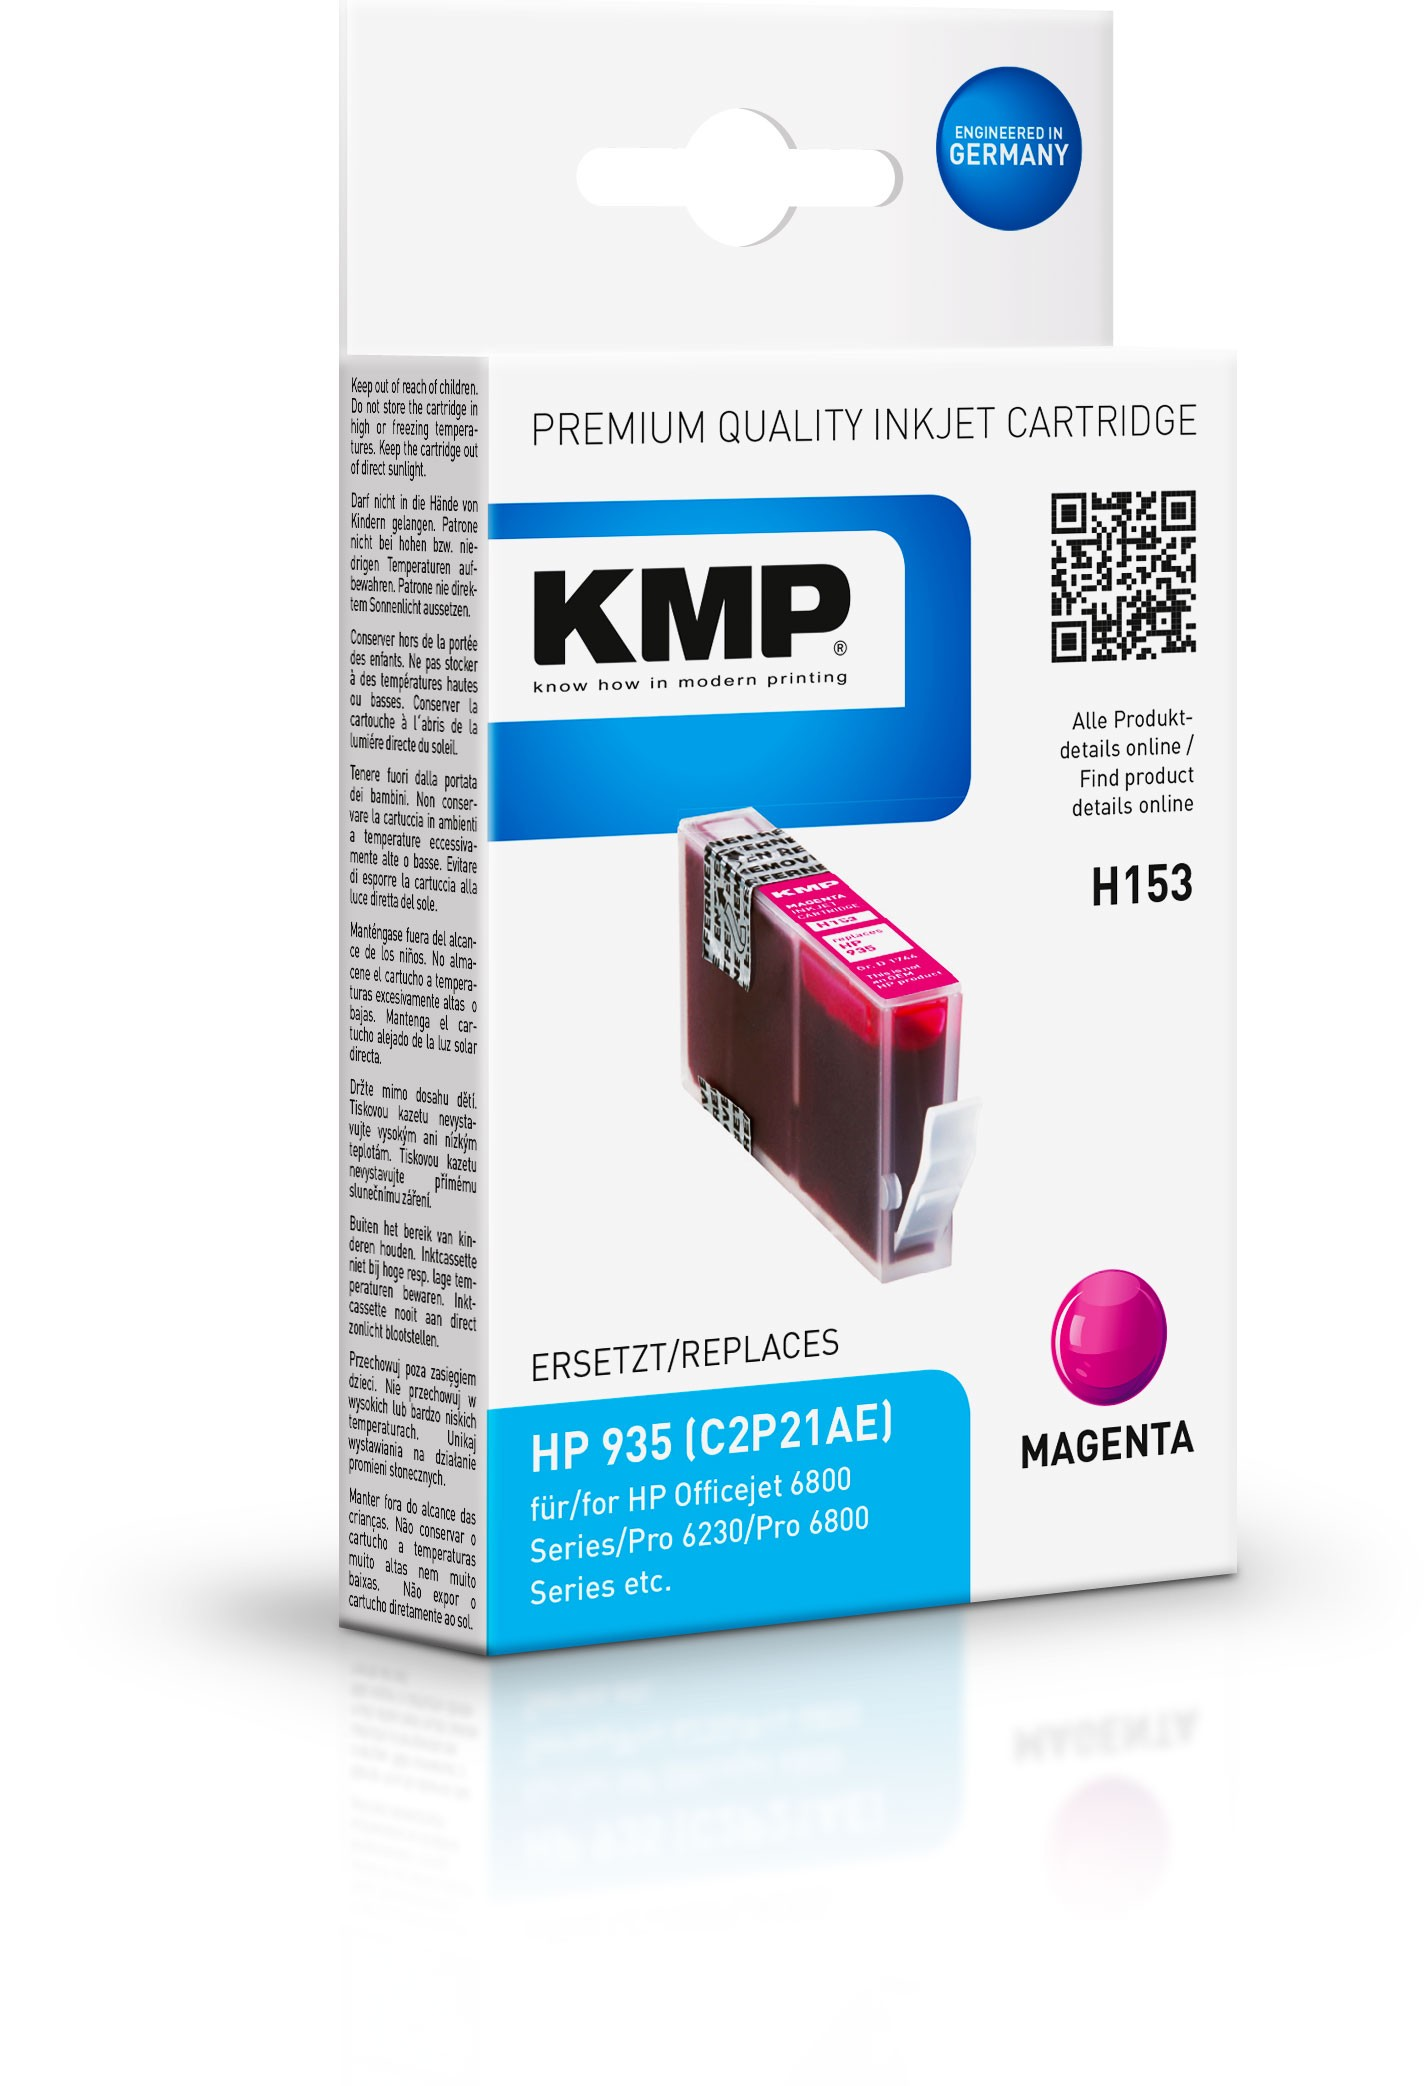 KMP Patrone H153 für C2P21AE HP935 Officejet 6800 etc. magenta